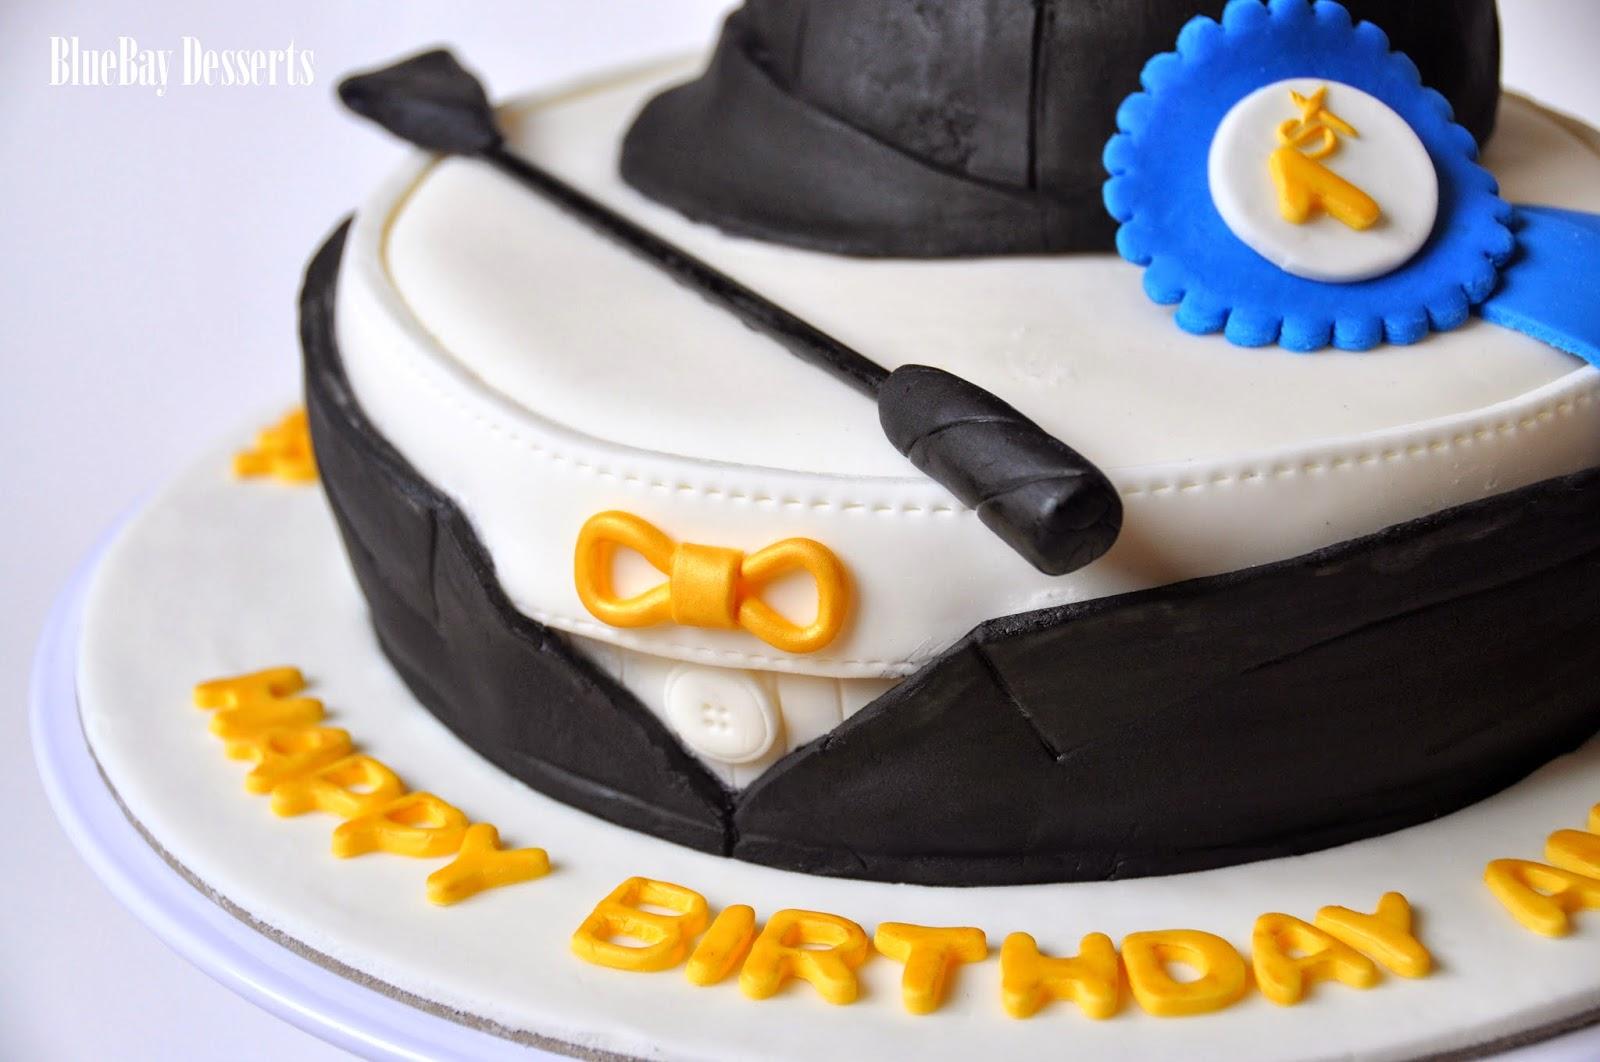 Bluebay Desserts Vancouver Bc Amys Equestrian Themed Birthday